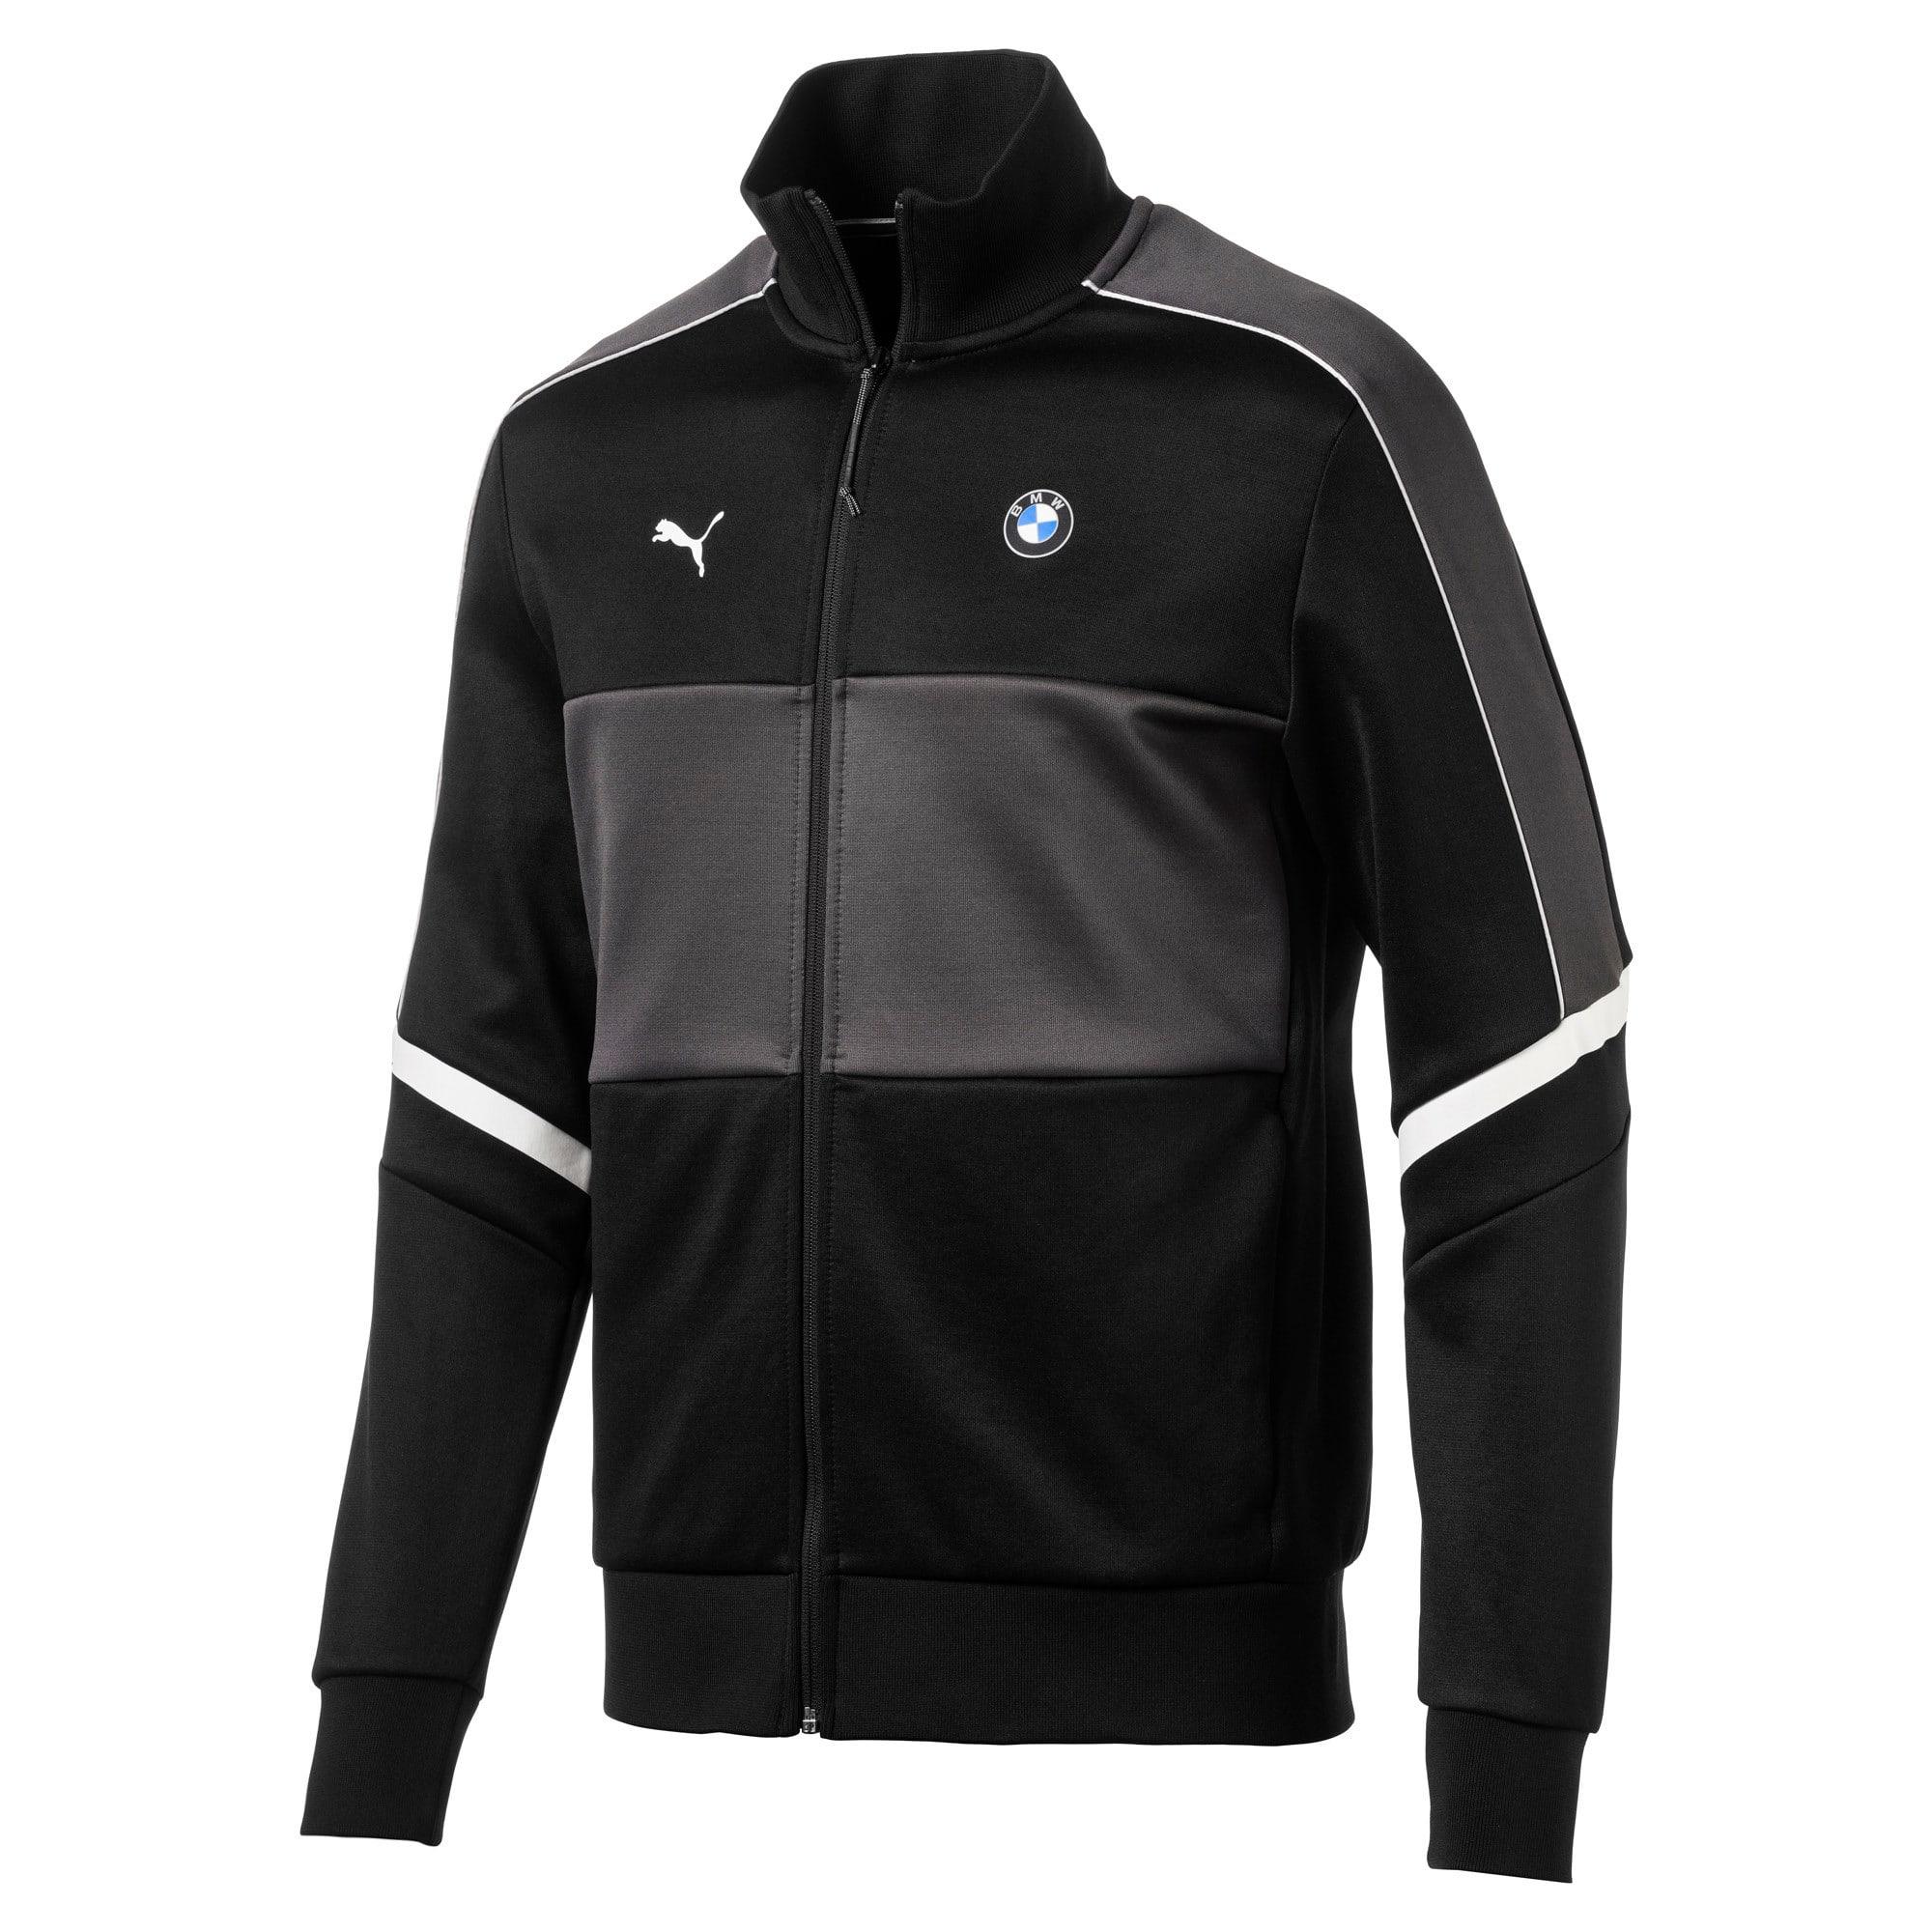 Thumbnail 2 of BMW M Motorsport Men's T7 Track Jacket, Puma Black, medium